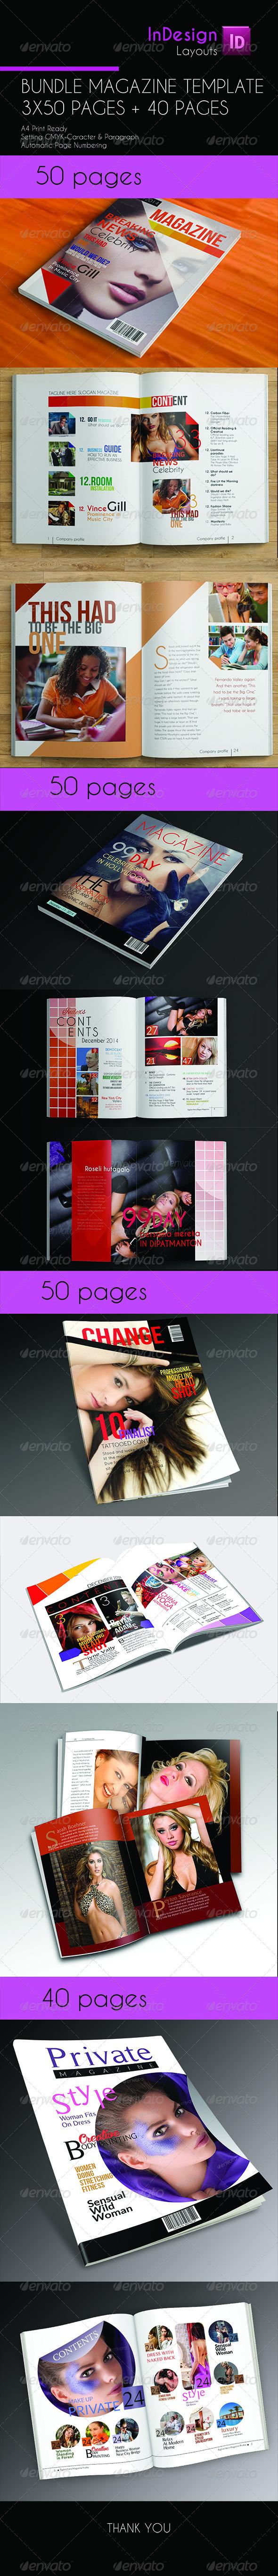 GraphicRiver MagzTemplate Bundle 6741342